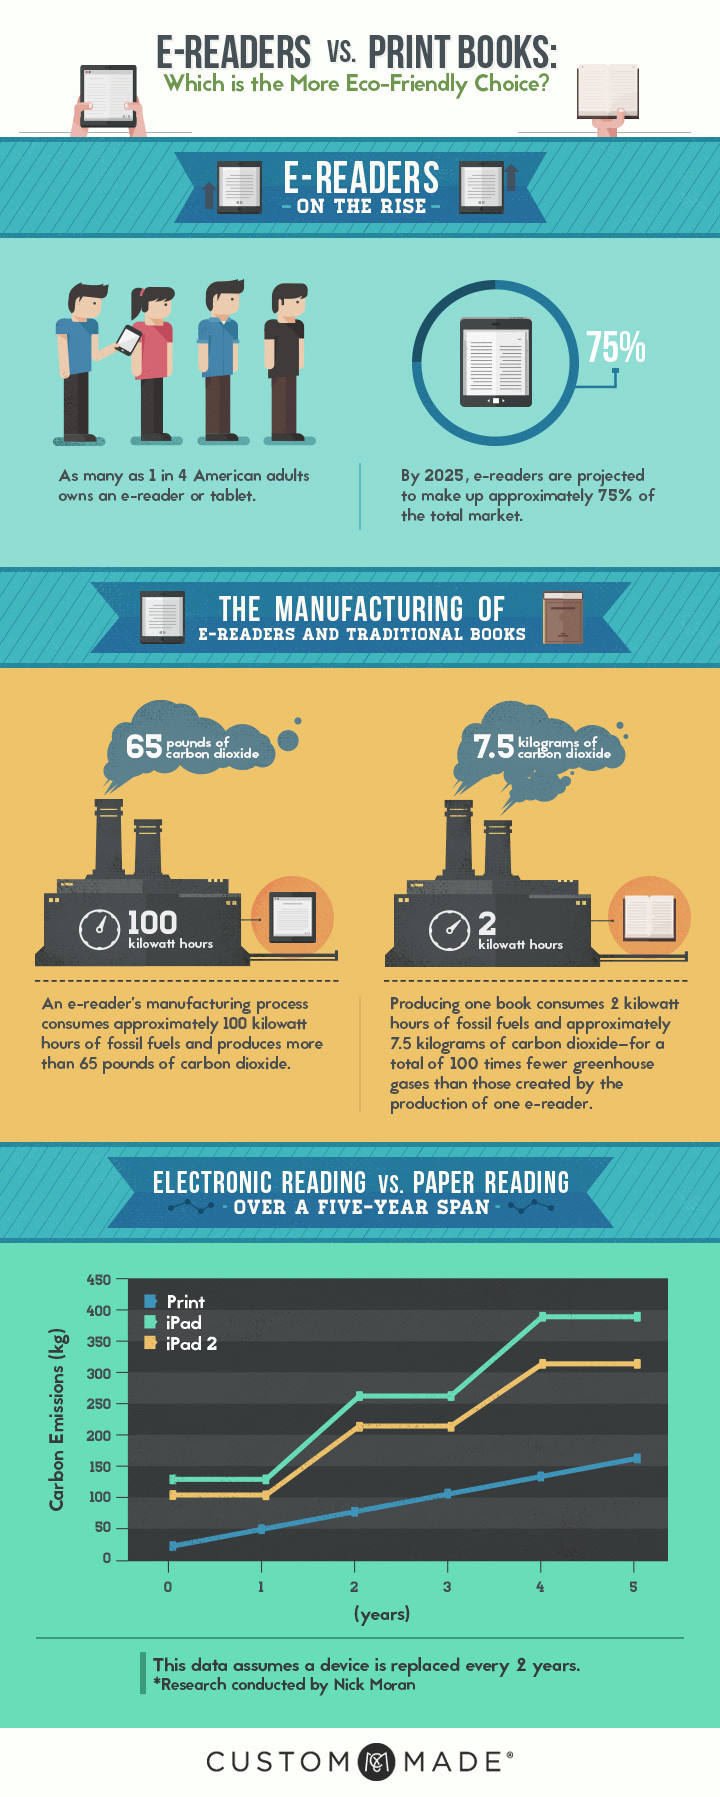 E-Readers Vs. Print Books: Which is More Eco-Friendly?